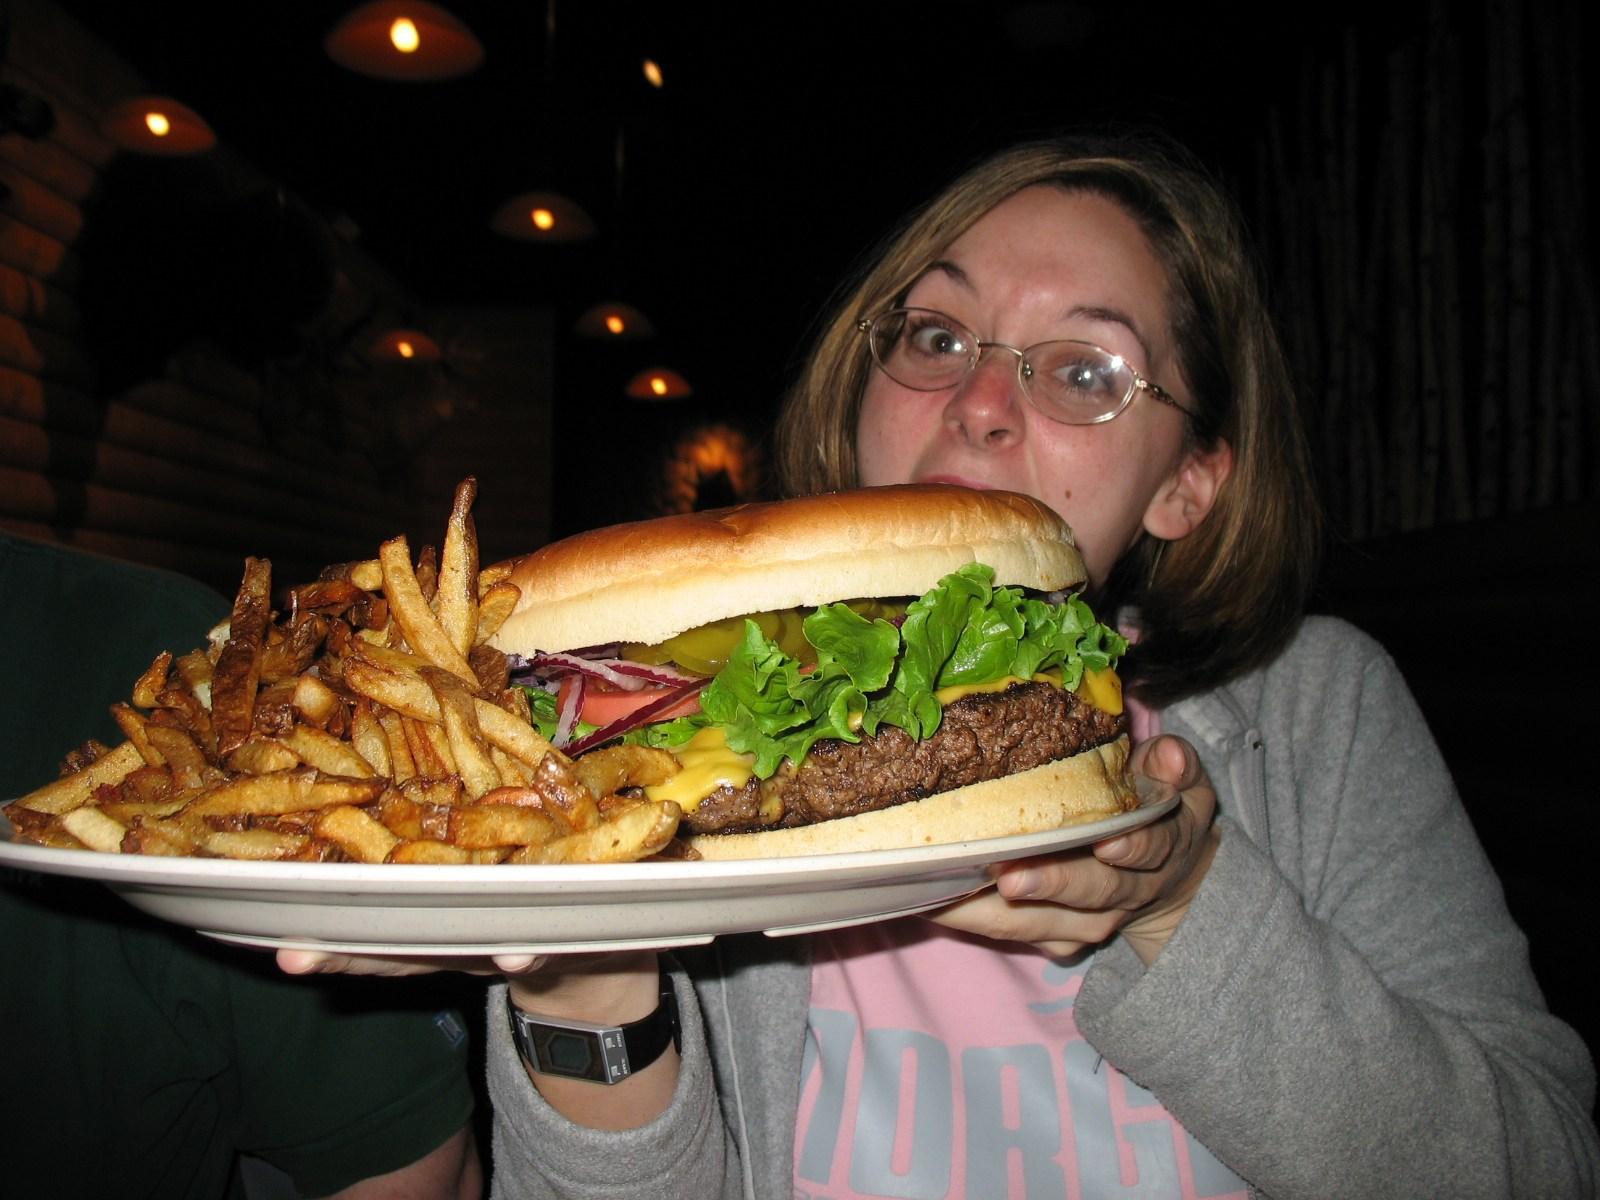 Sasquatch burger from Bigfoot Lodge